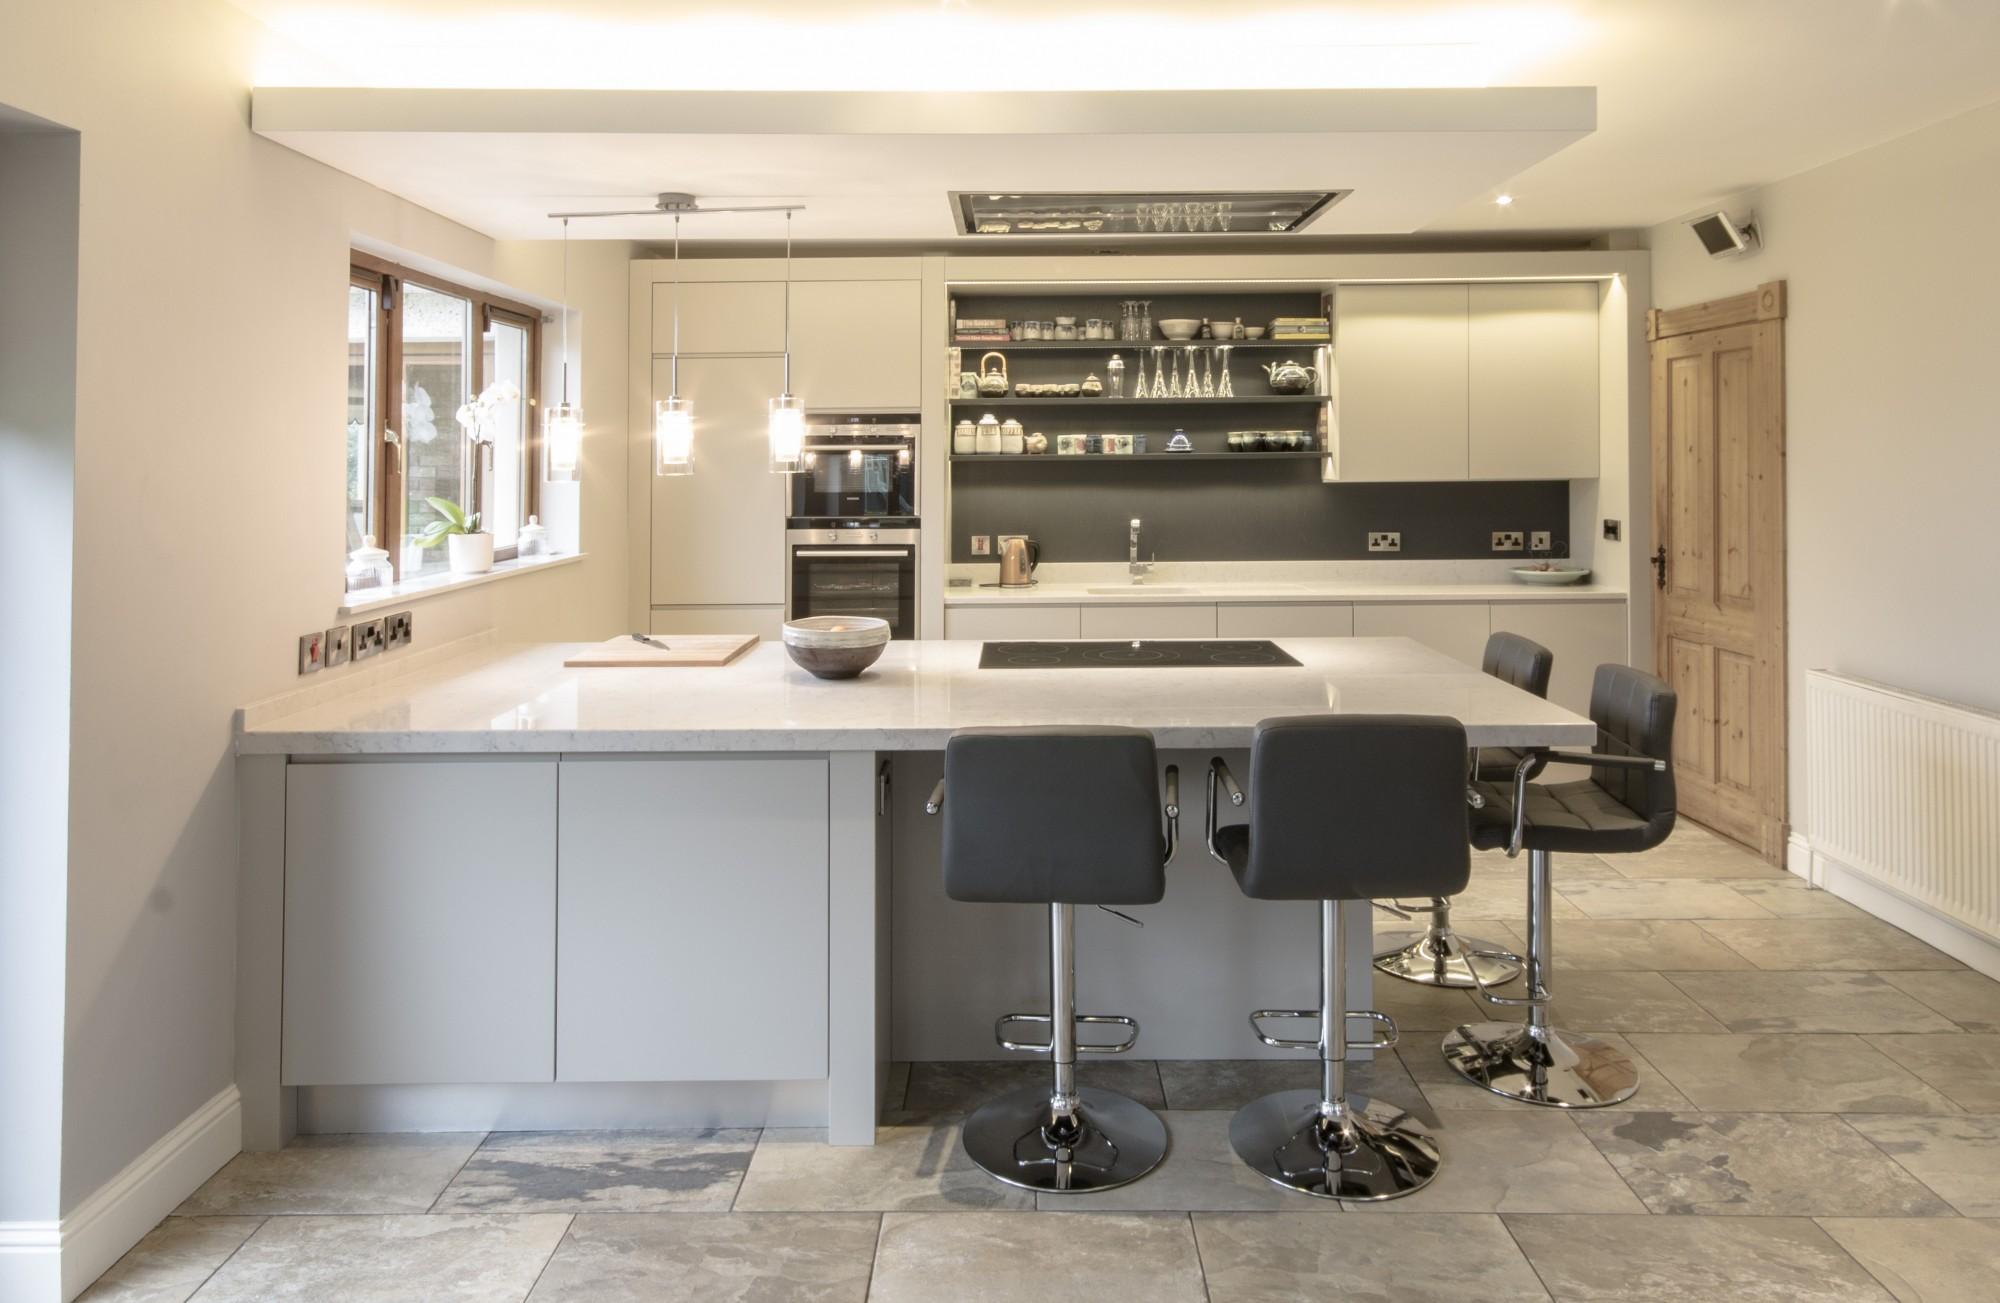 enigma design » finger groove flat panel kitchen design enigma